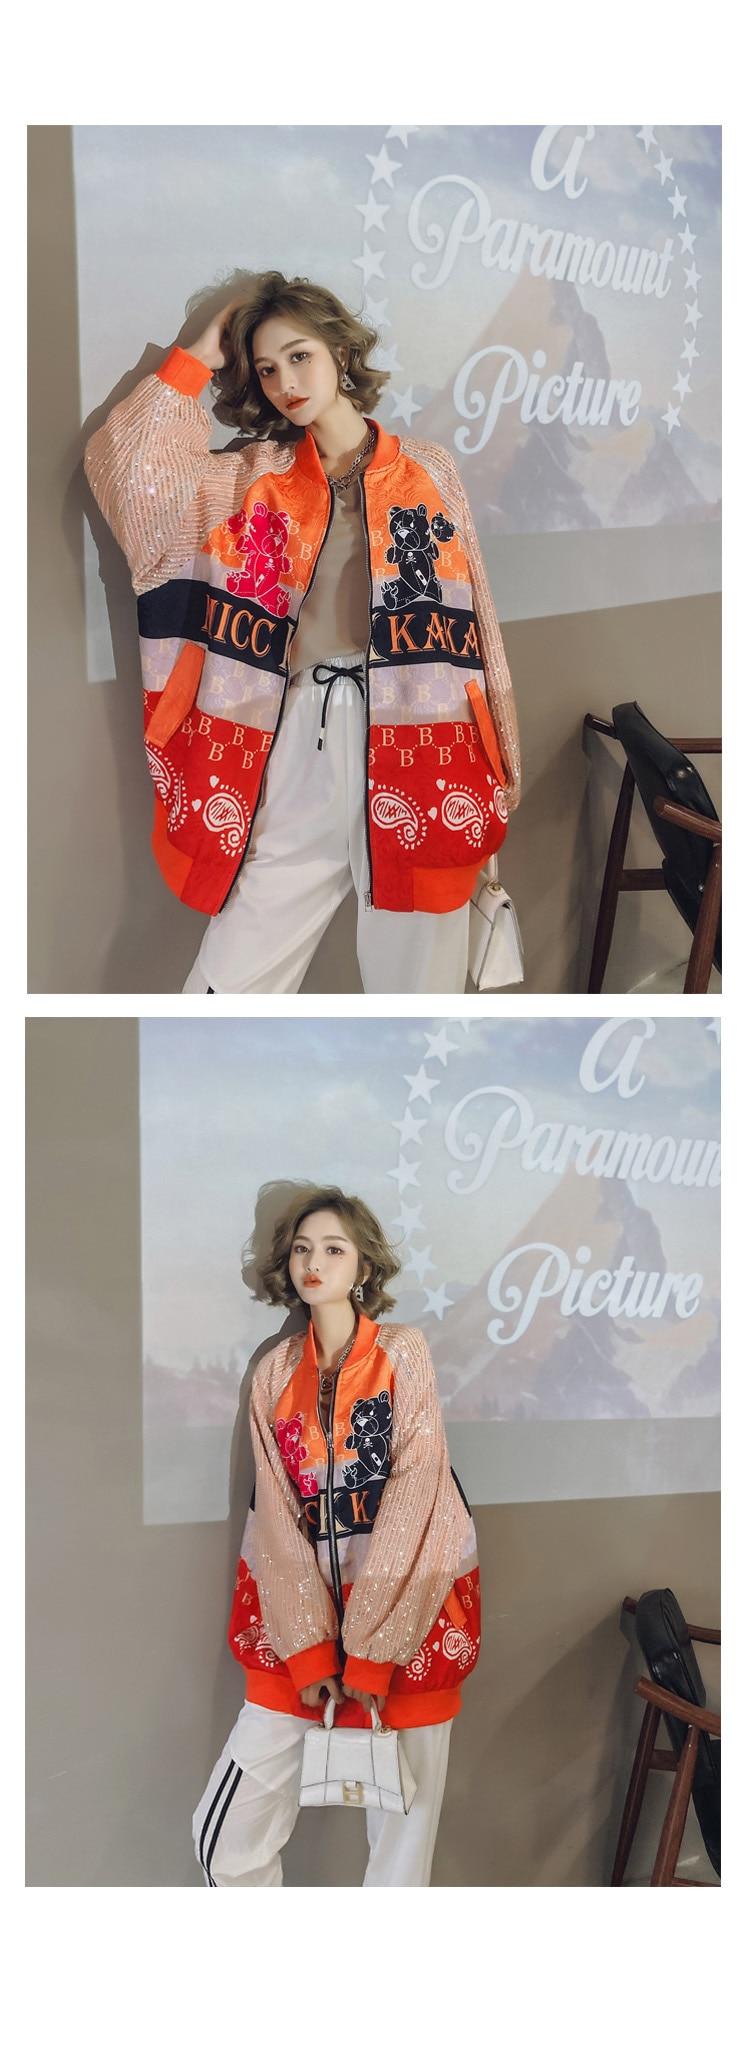 H9a4213a95ab248a7912ea071cf3e0030H 2021 Spring Women Long Sequins Print Patchwork Loose Coat